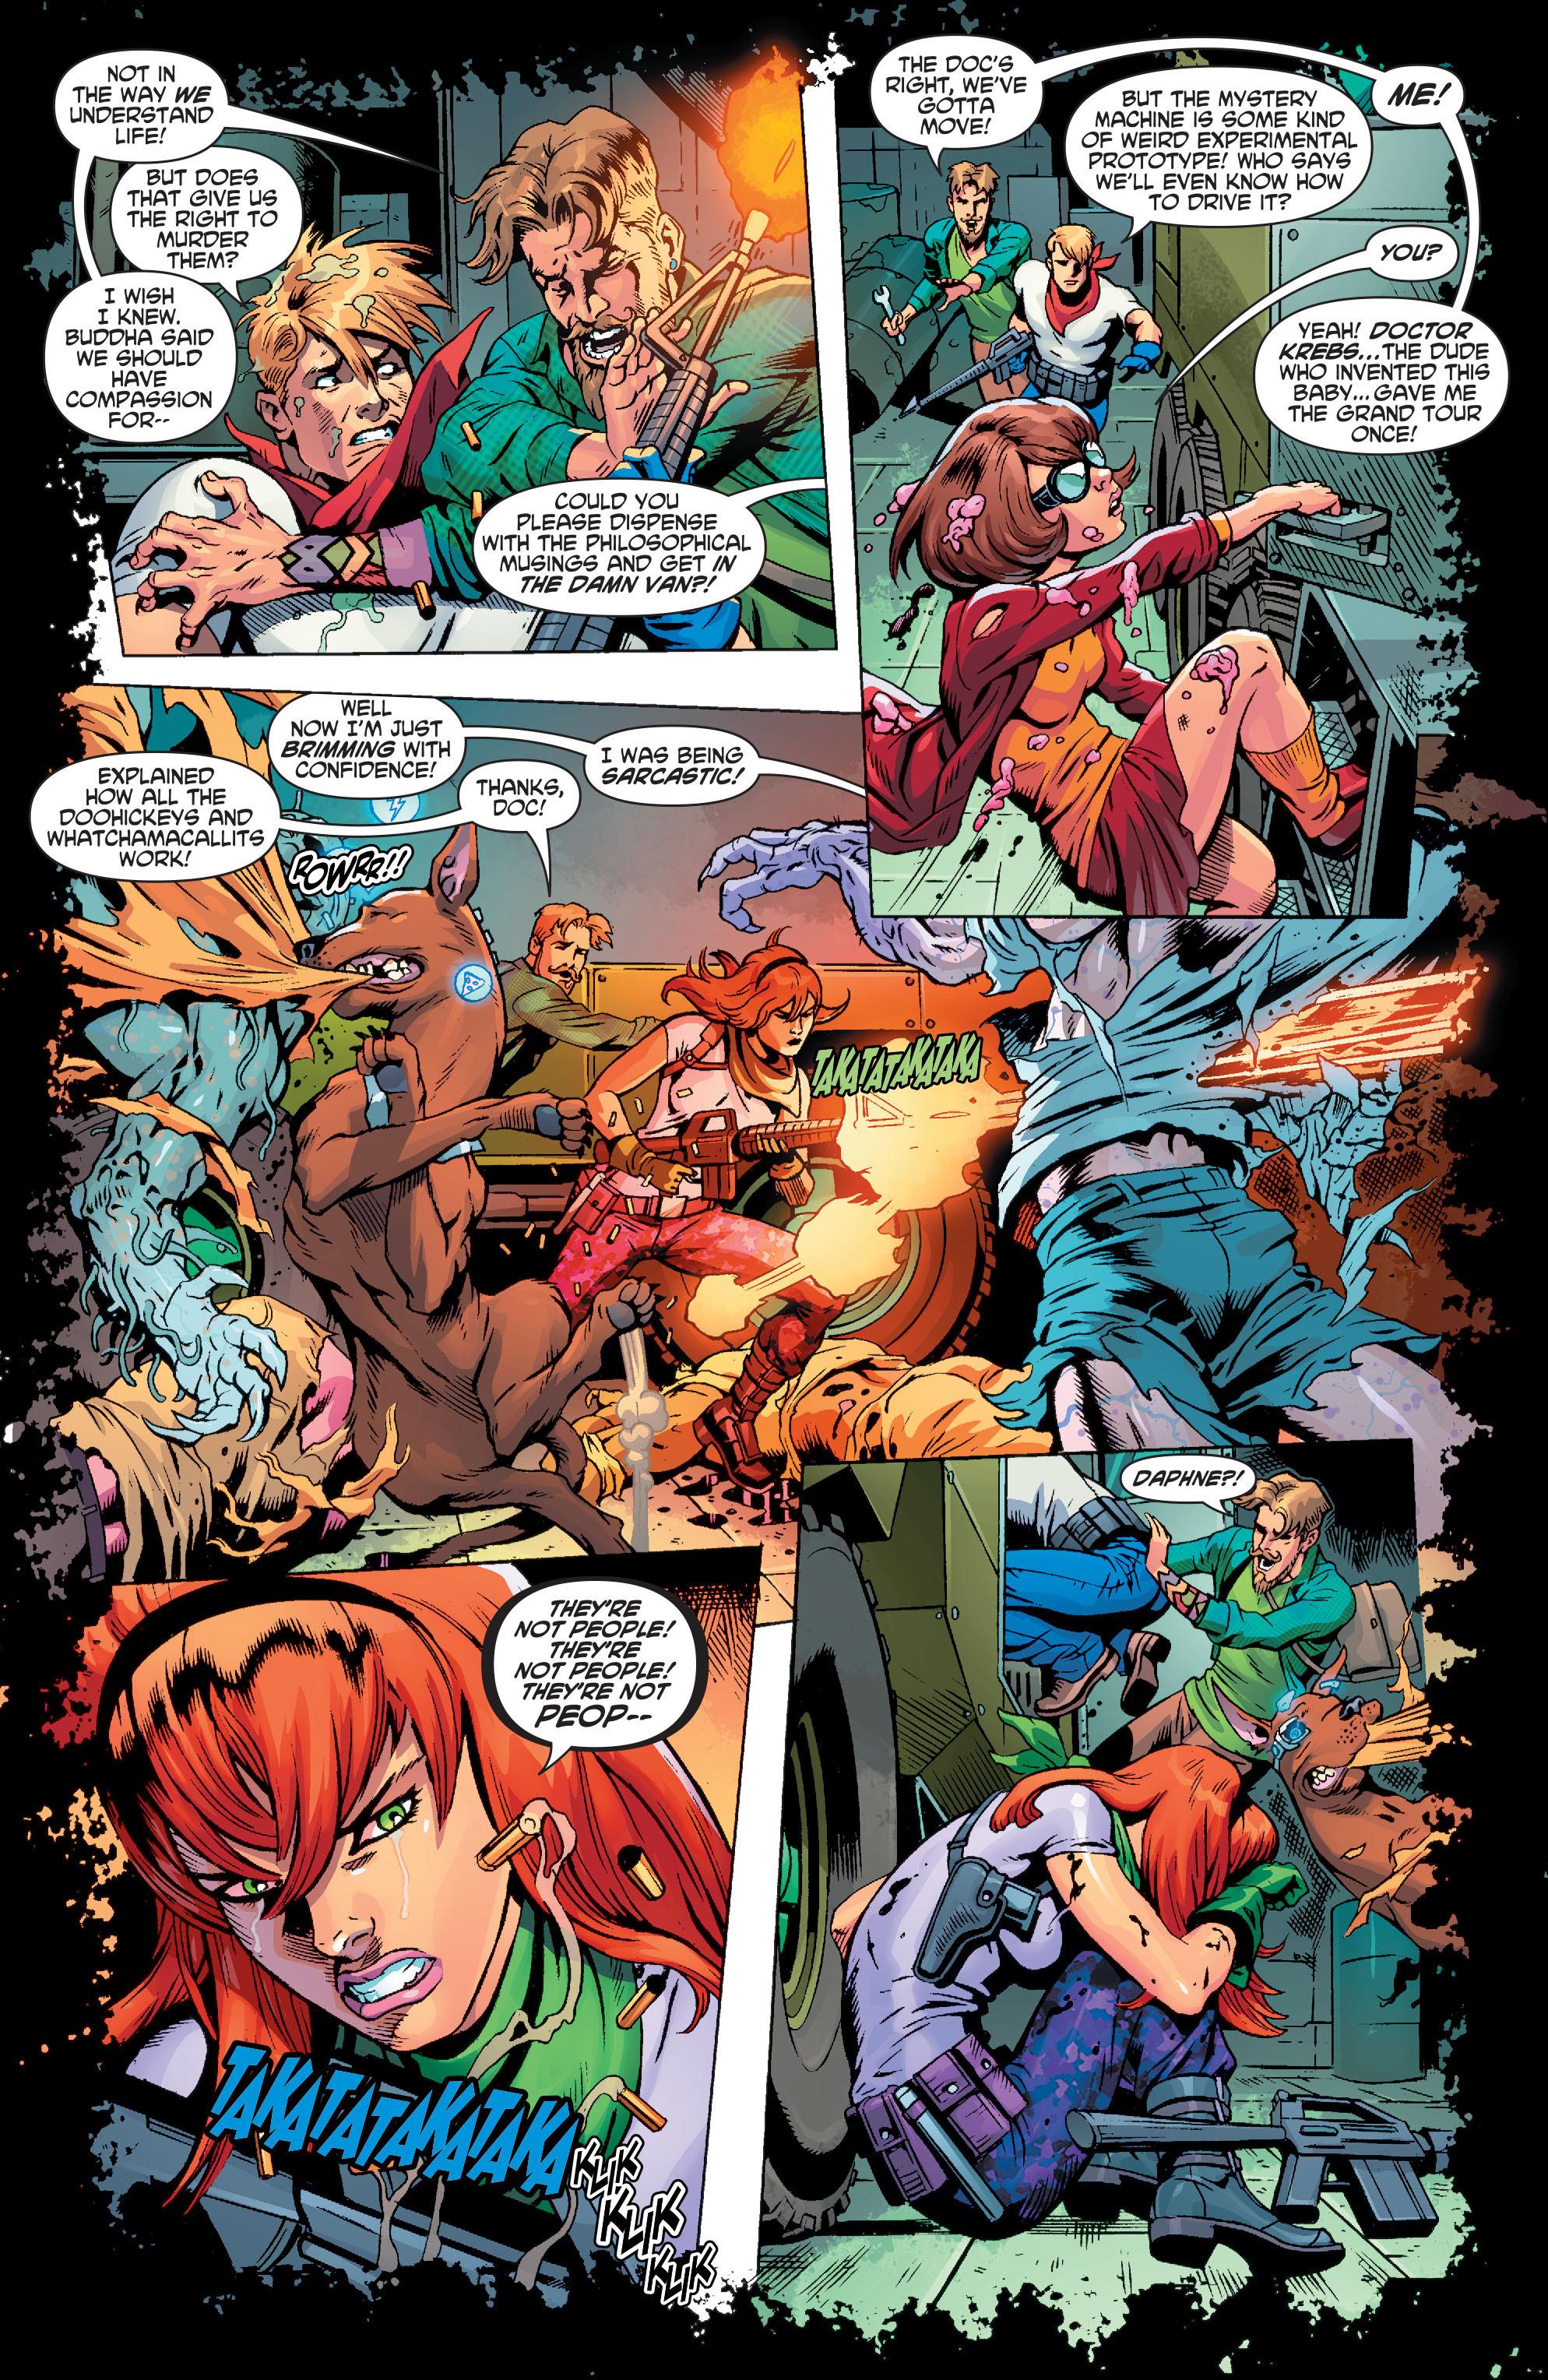 Read online Scooby Apocalypse comic -  Issue #3 - 9